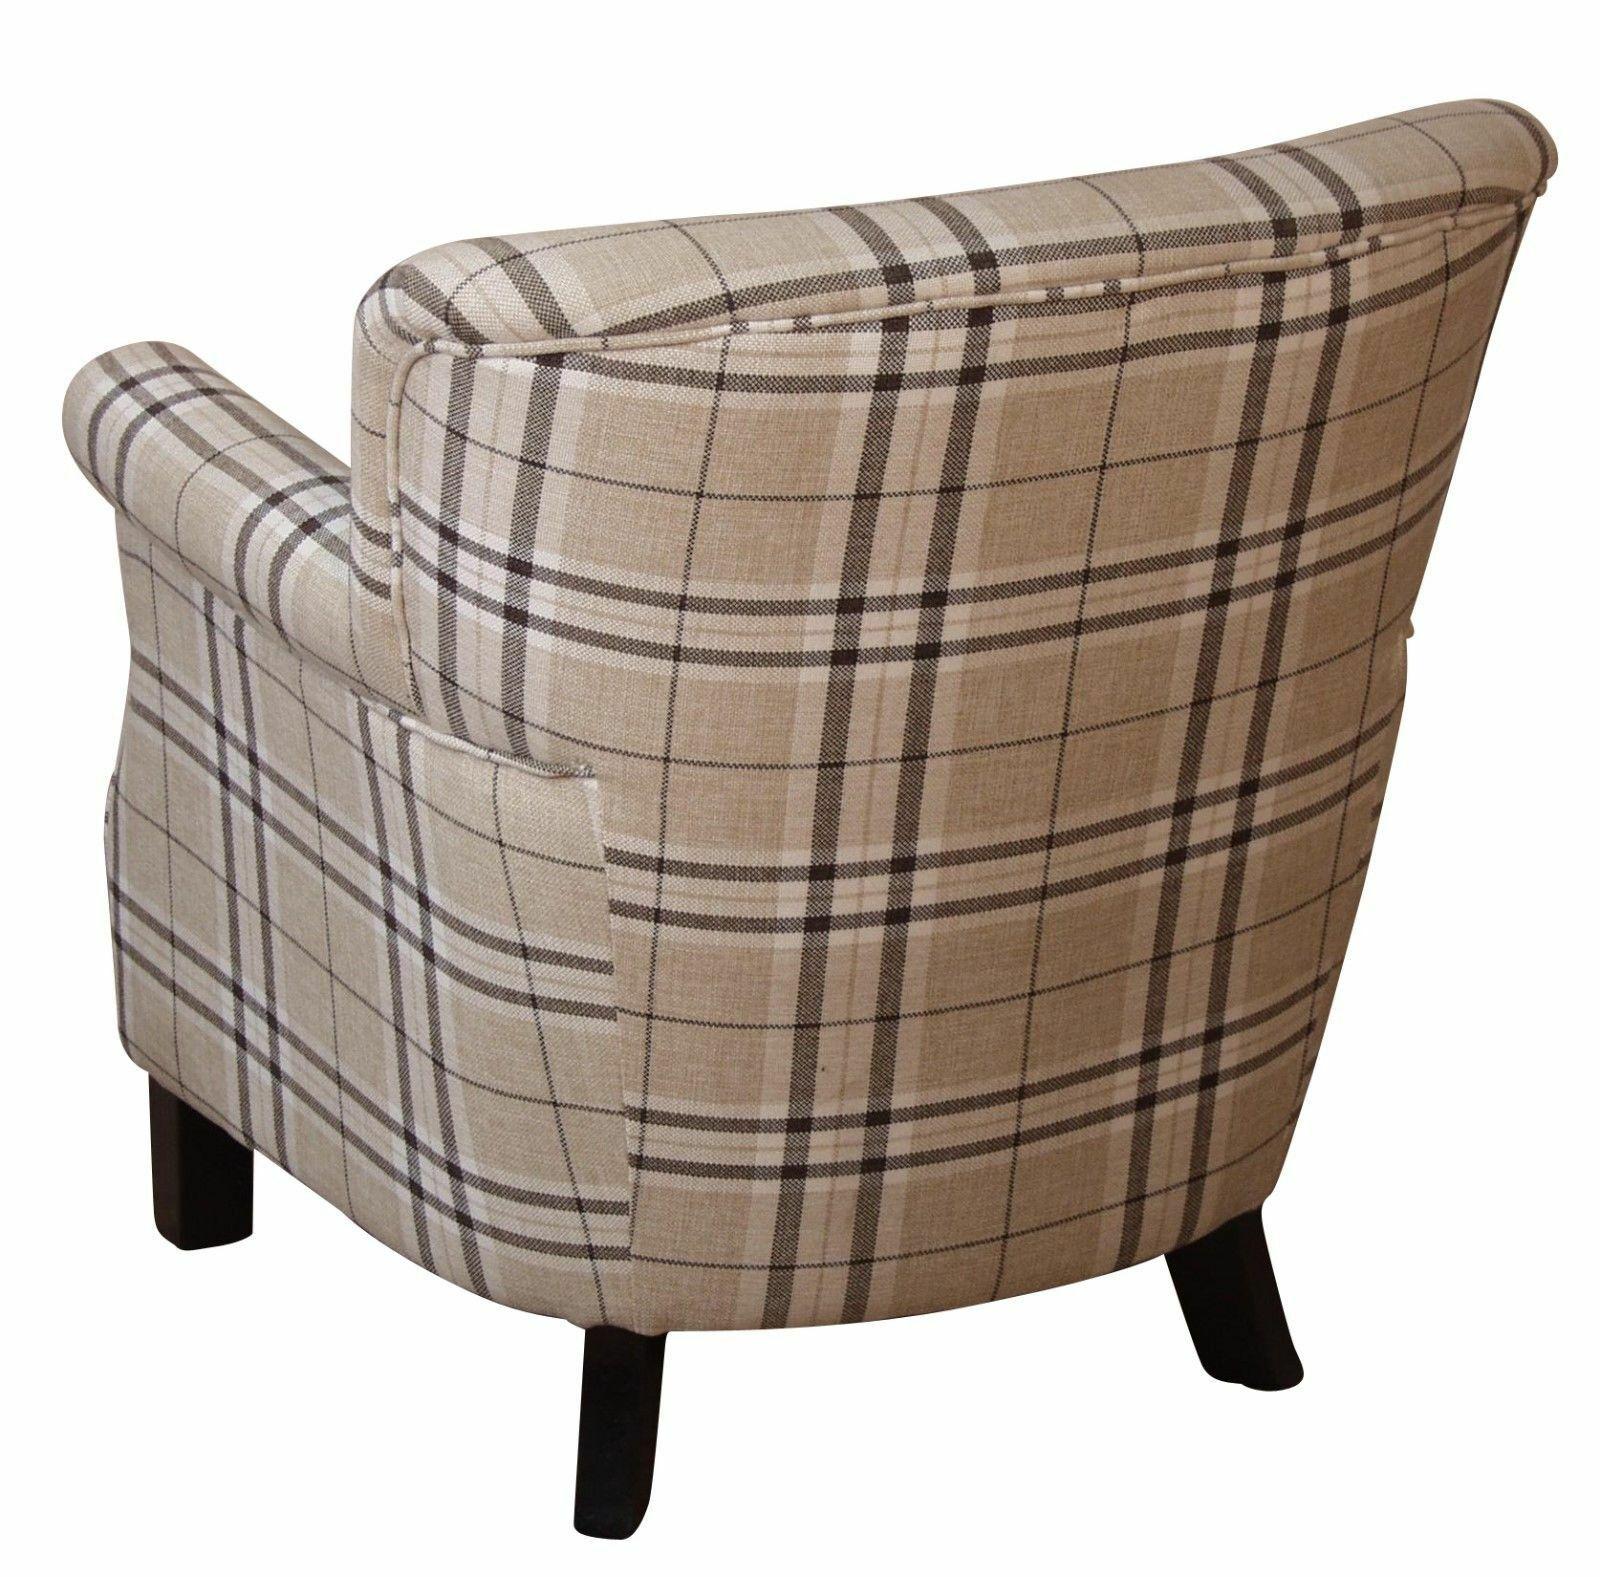 Moderner Sessel Kariert Stoff Polstersessel Design Fernsehsessel